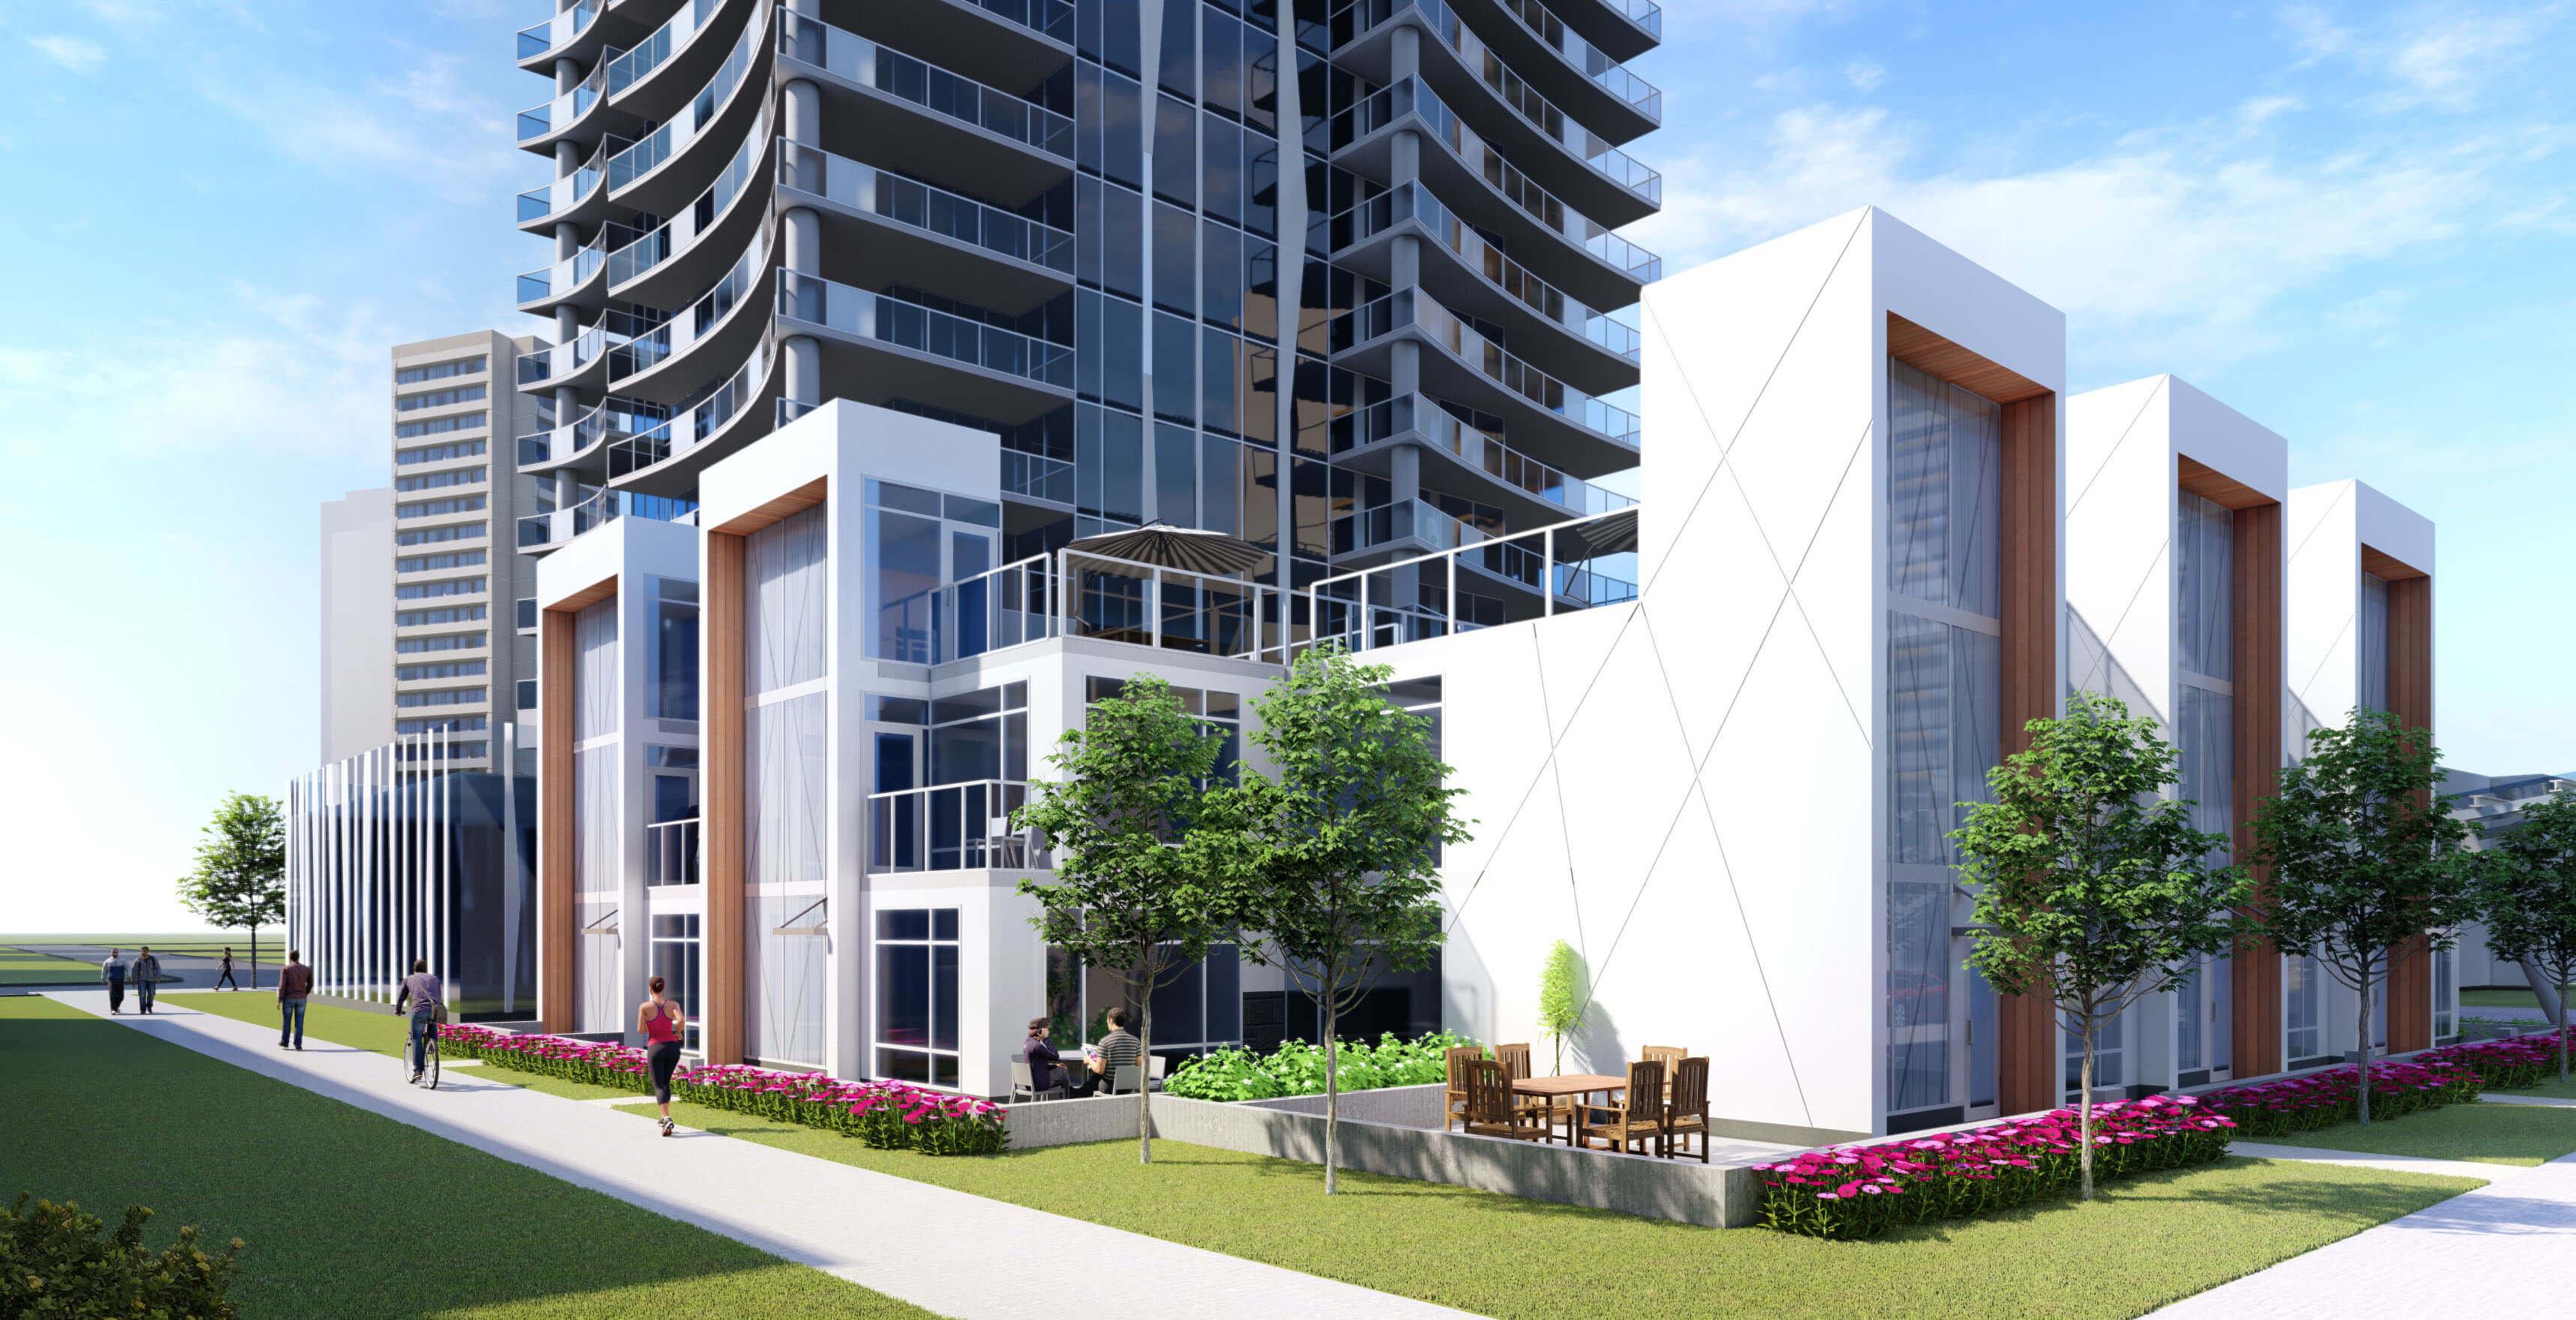 Building Exterior - 6390 Willingdon Ave, Burnaby, BC V5H 2V5, Canada !